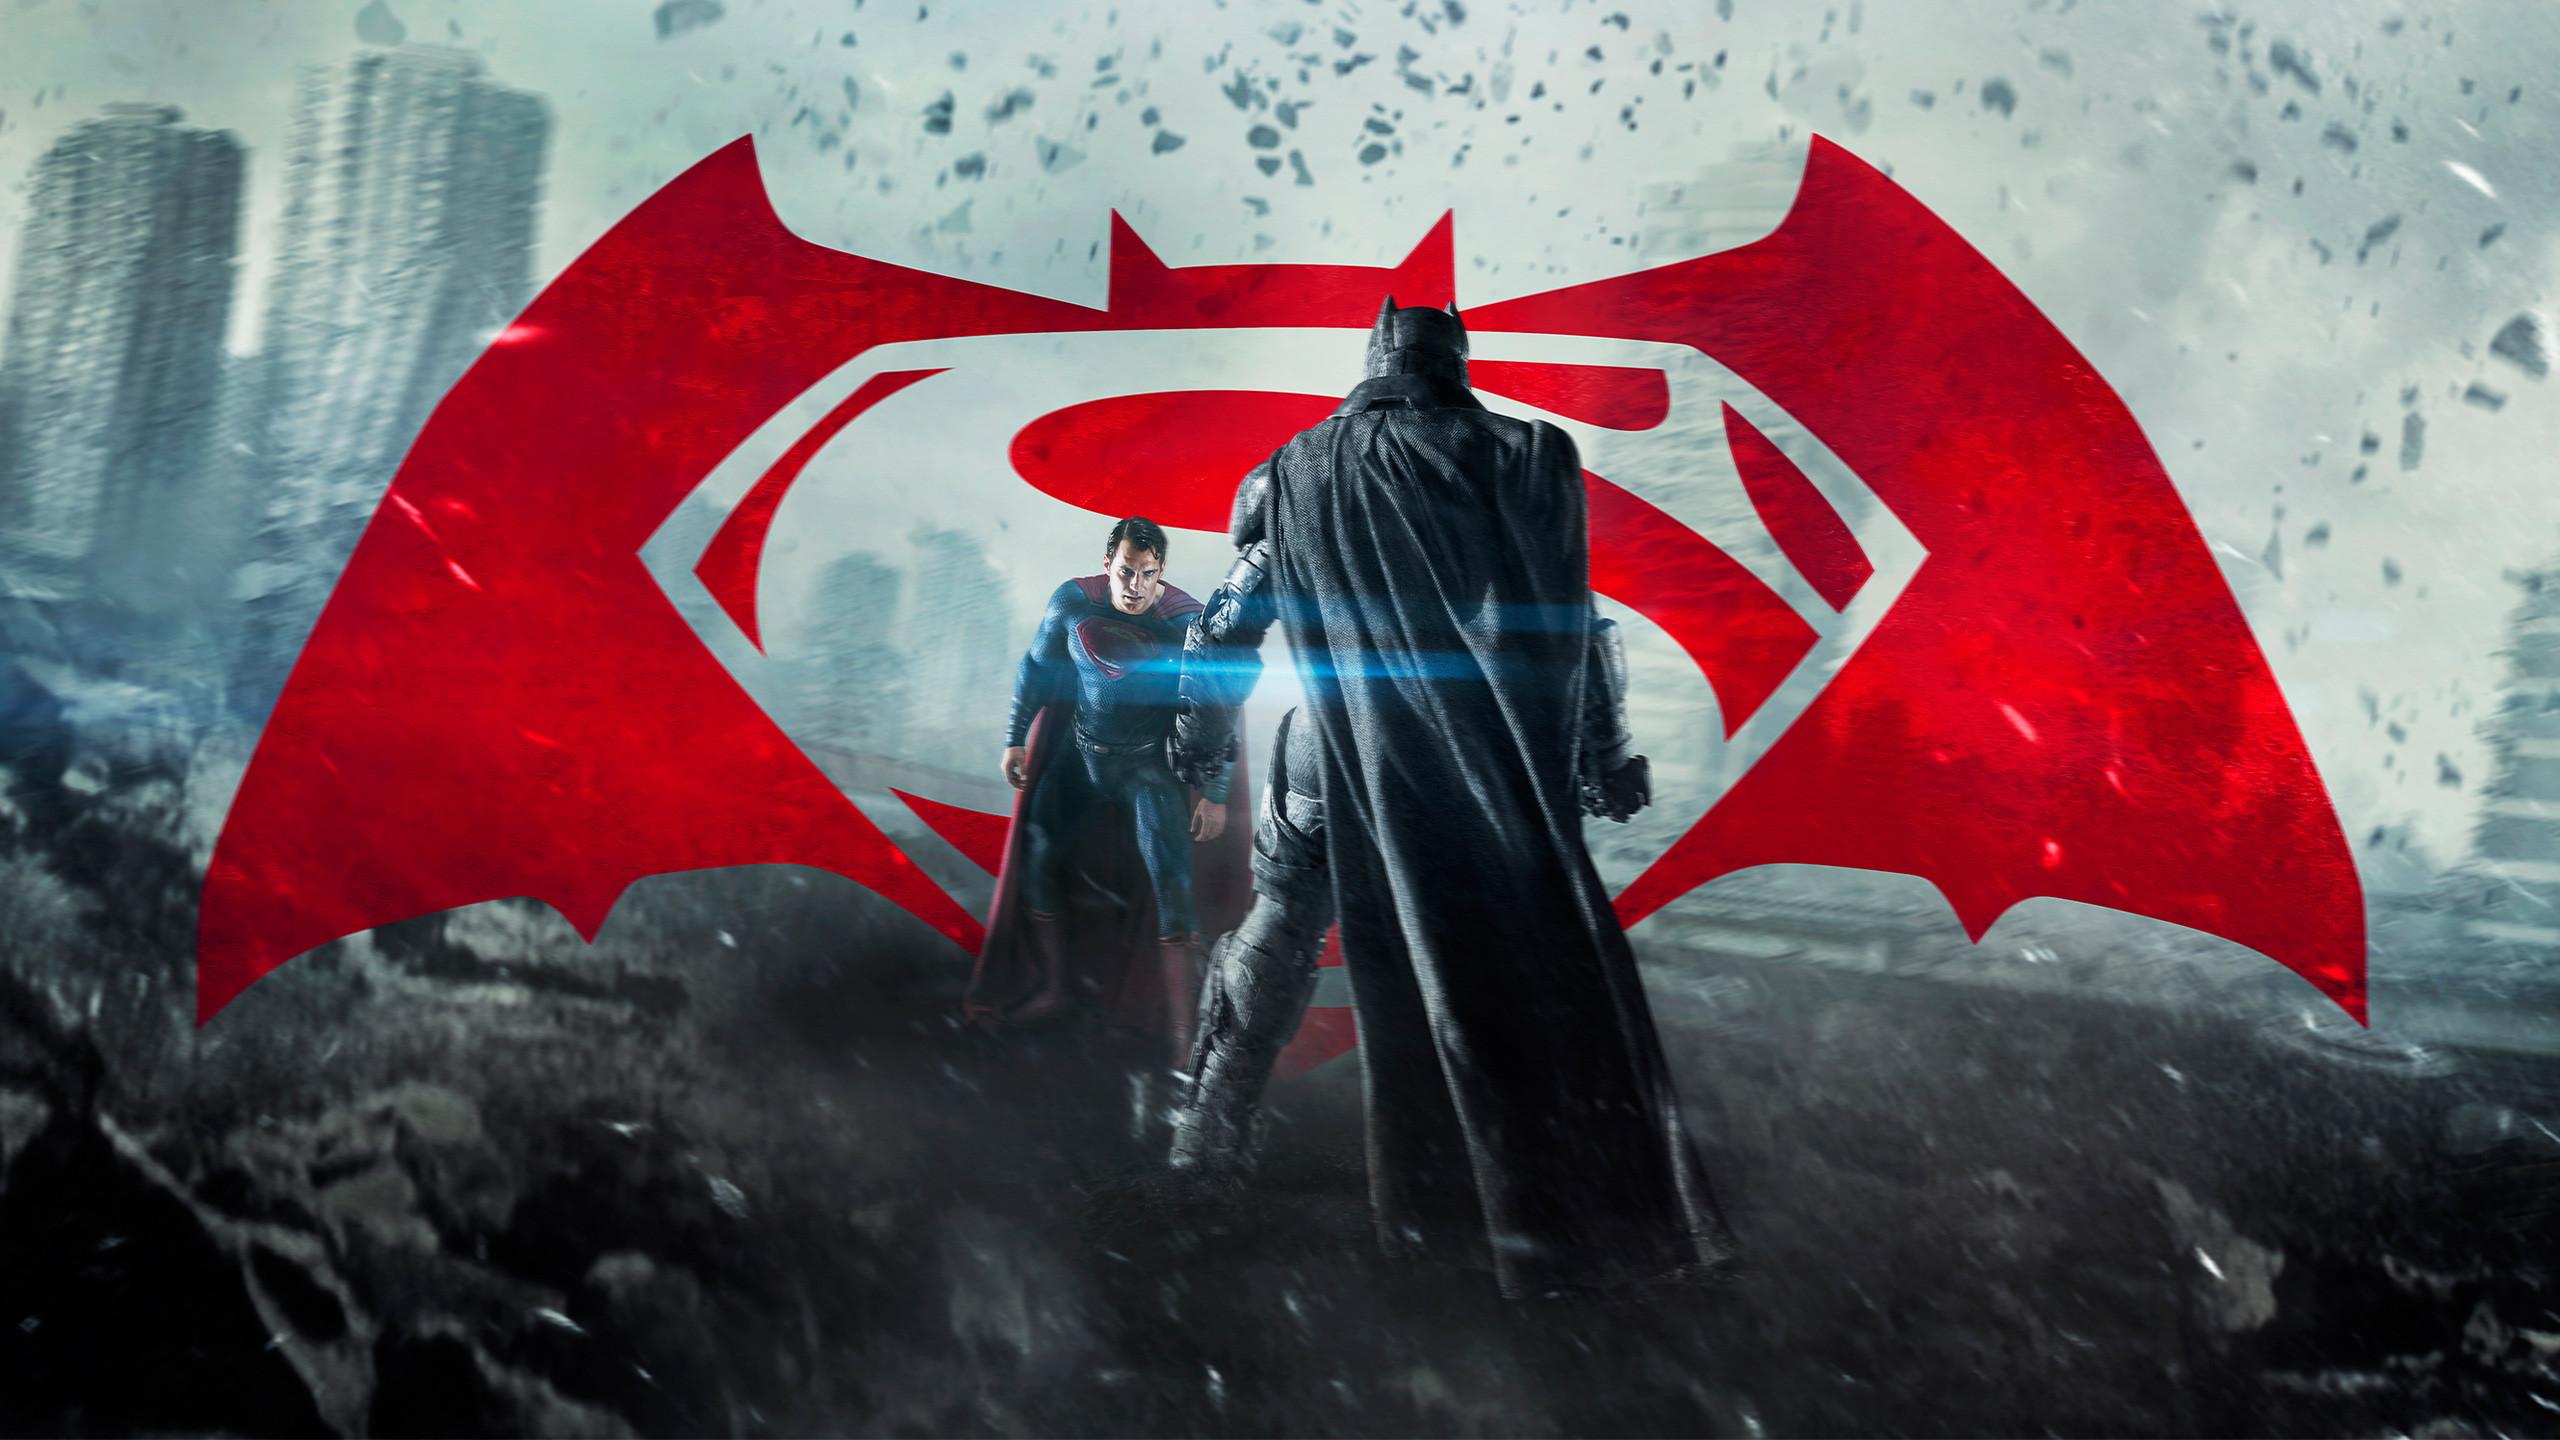 Batman v <b>Superman Ultra HD 4K Wallpaper</b> | uhd4kwallpapers